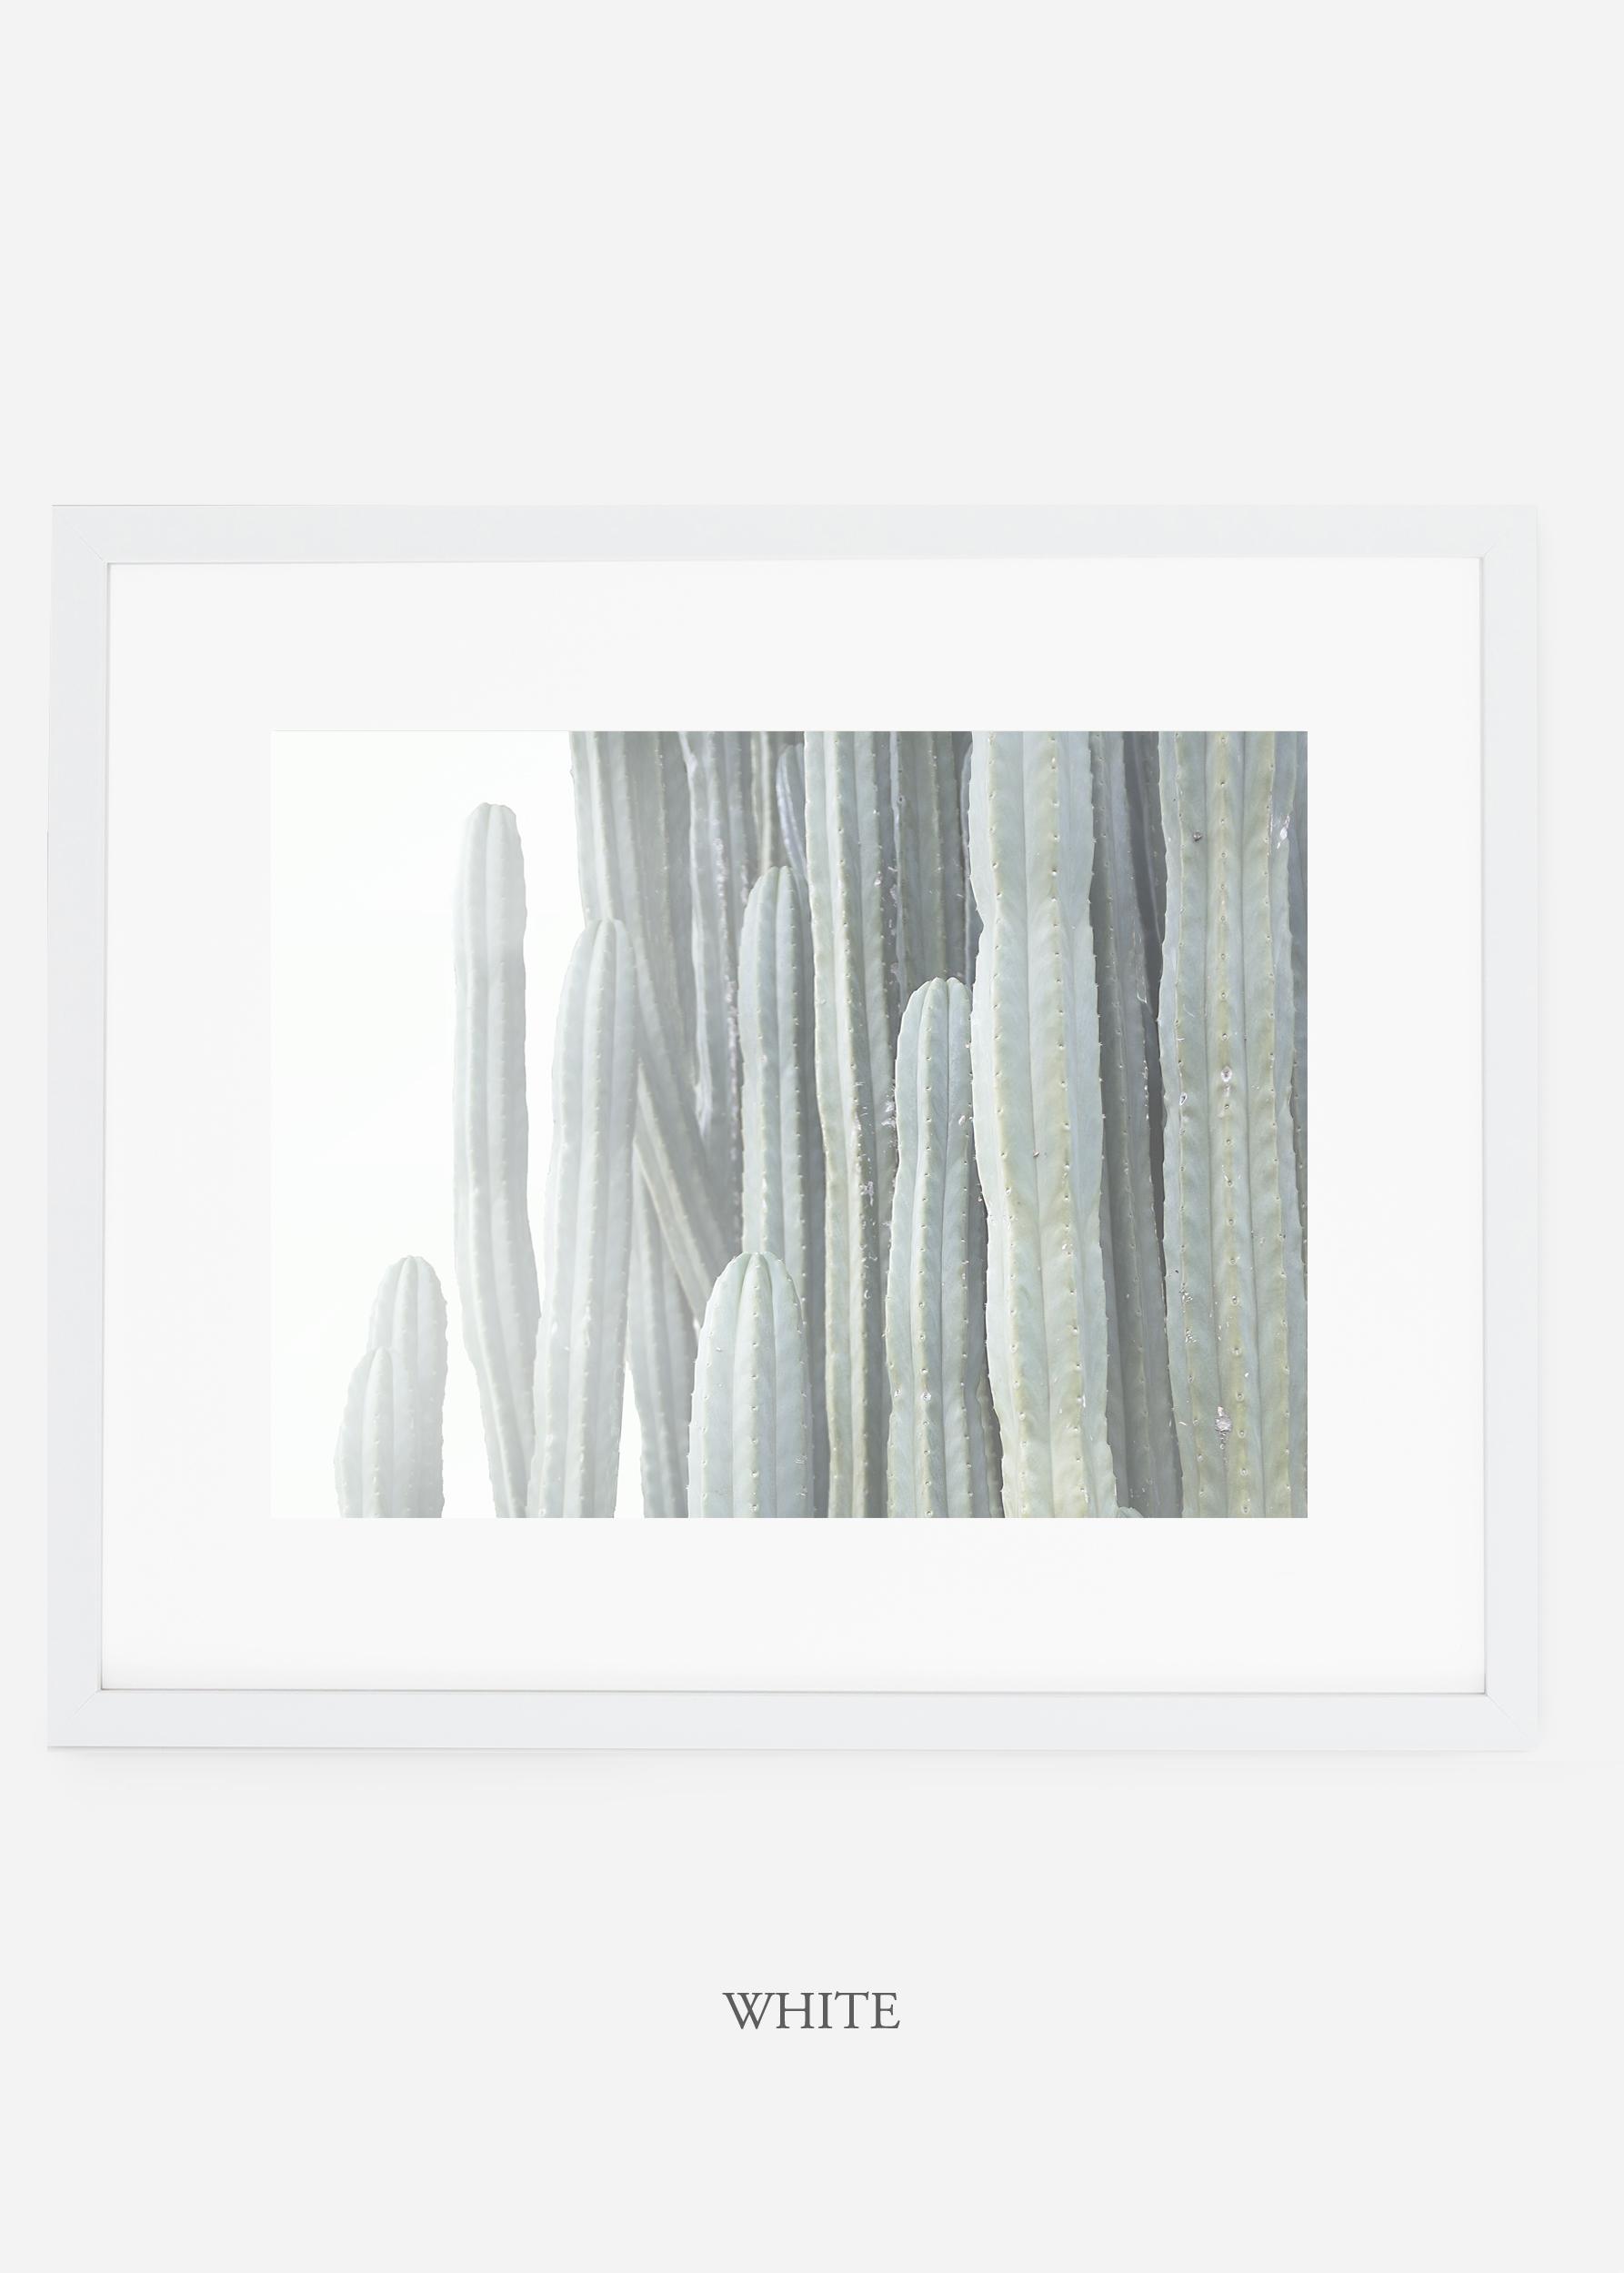 WilderCalifornia_whiteframe__Cactus_Art_Photography_interiordesign_white_bohemian_neutral_photography_photo.jpg